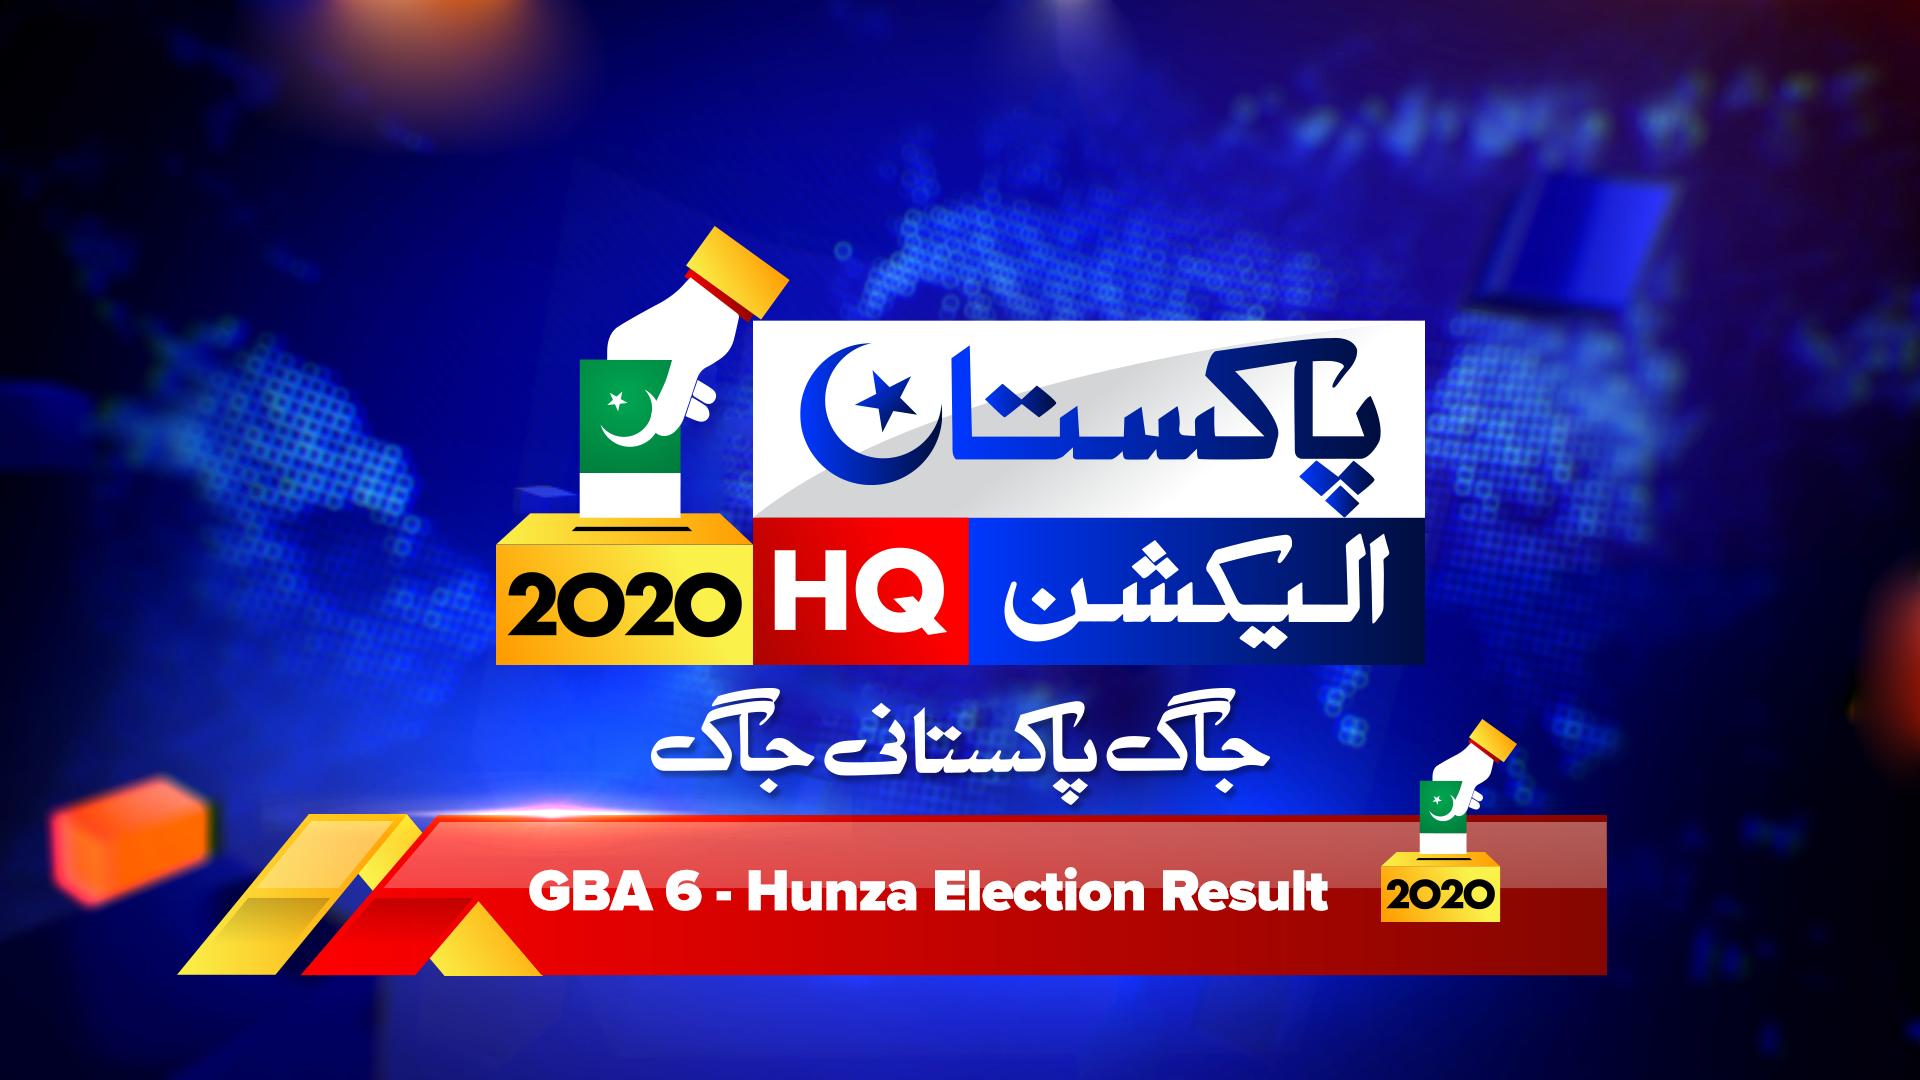 GBA 6 Gilgit 6 Election Result